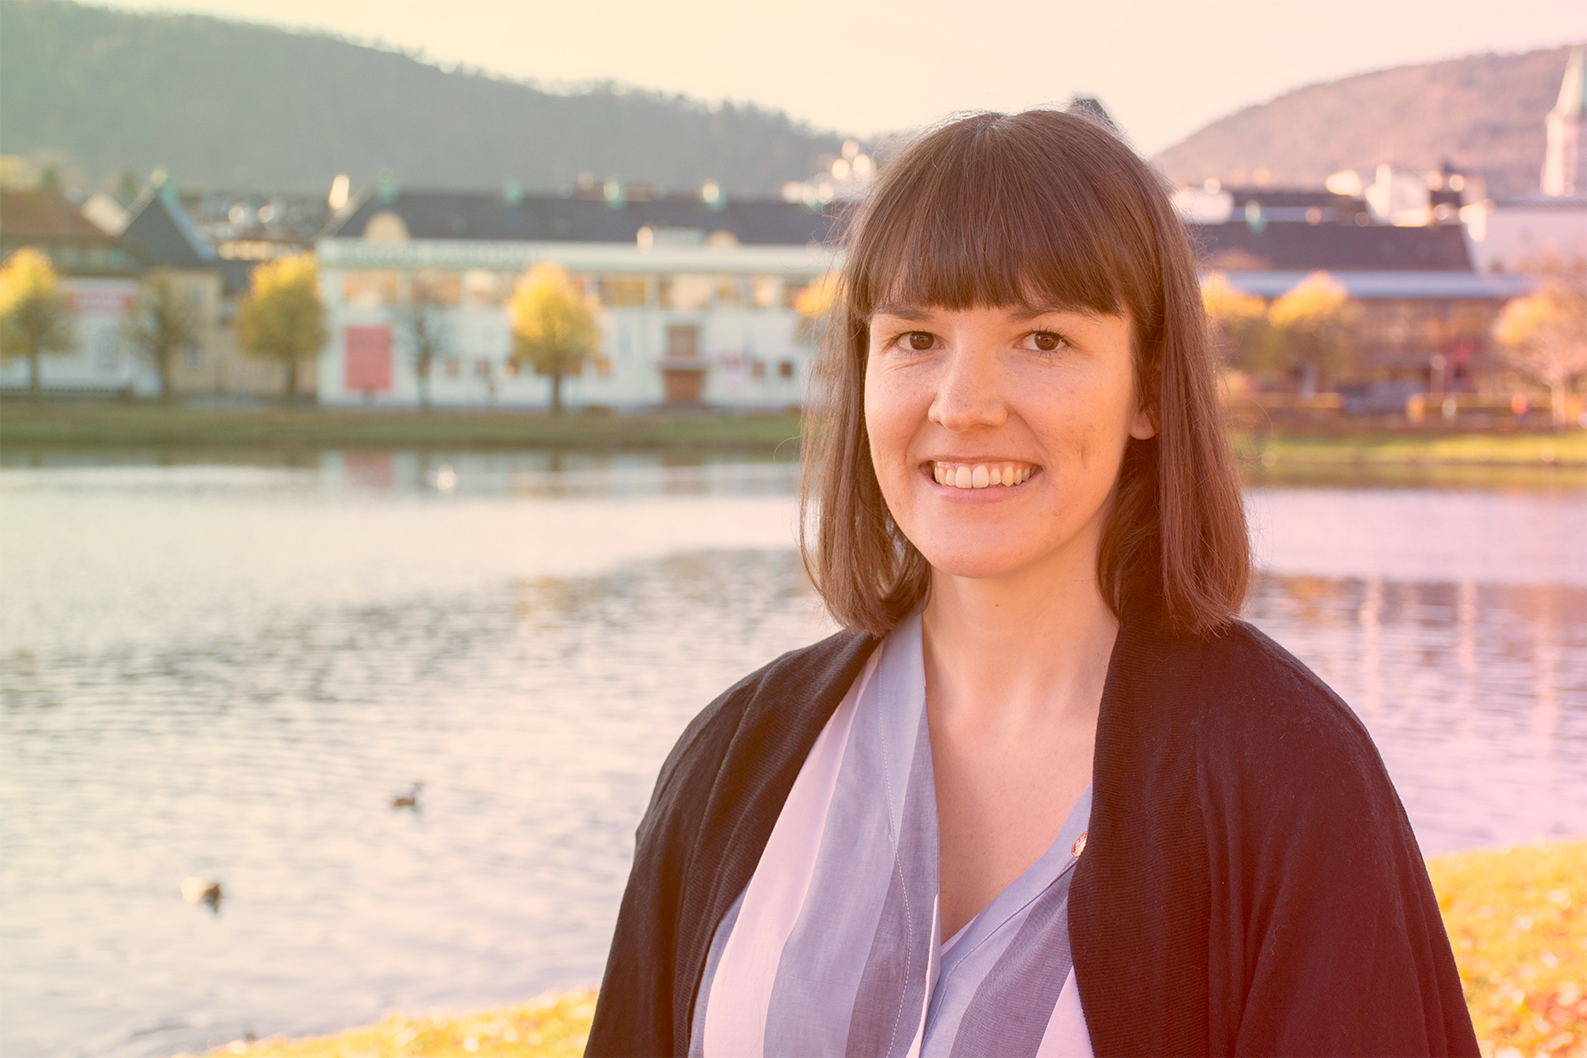 Katrine Nødtvedt - byråd for kultur, mangfold og likestilling i Bergen kommune. (Foto: Bergen kommune)